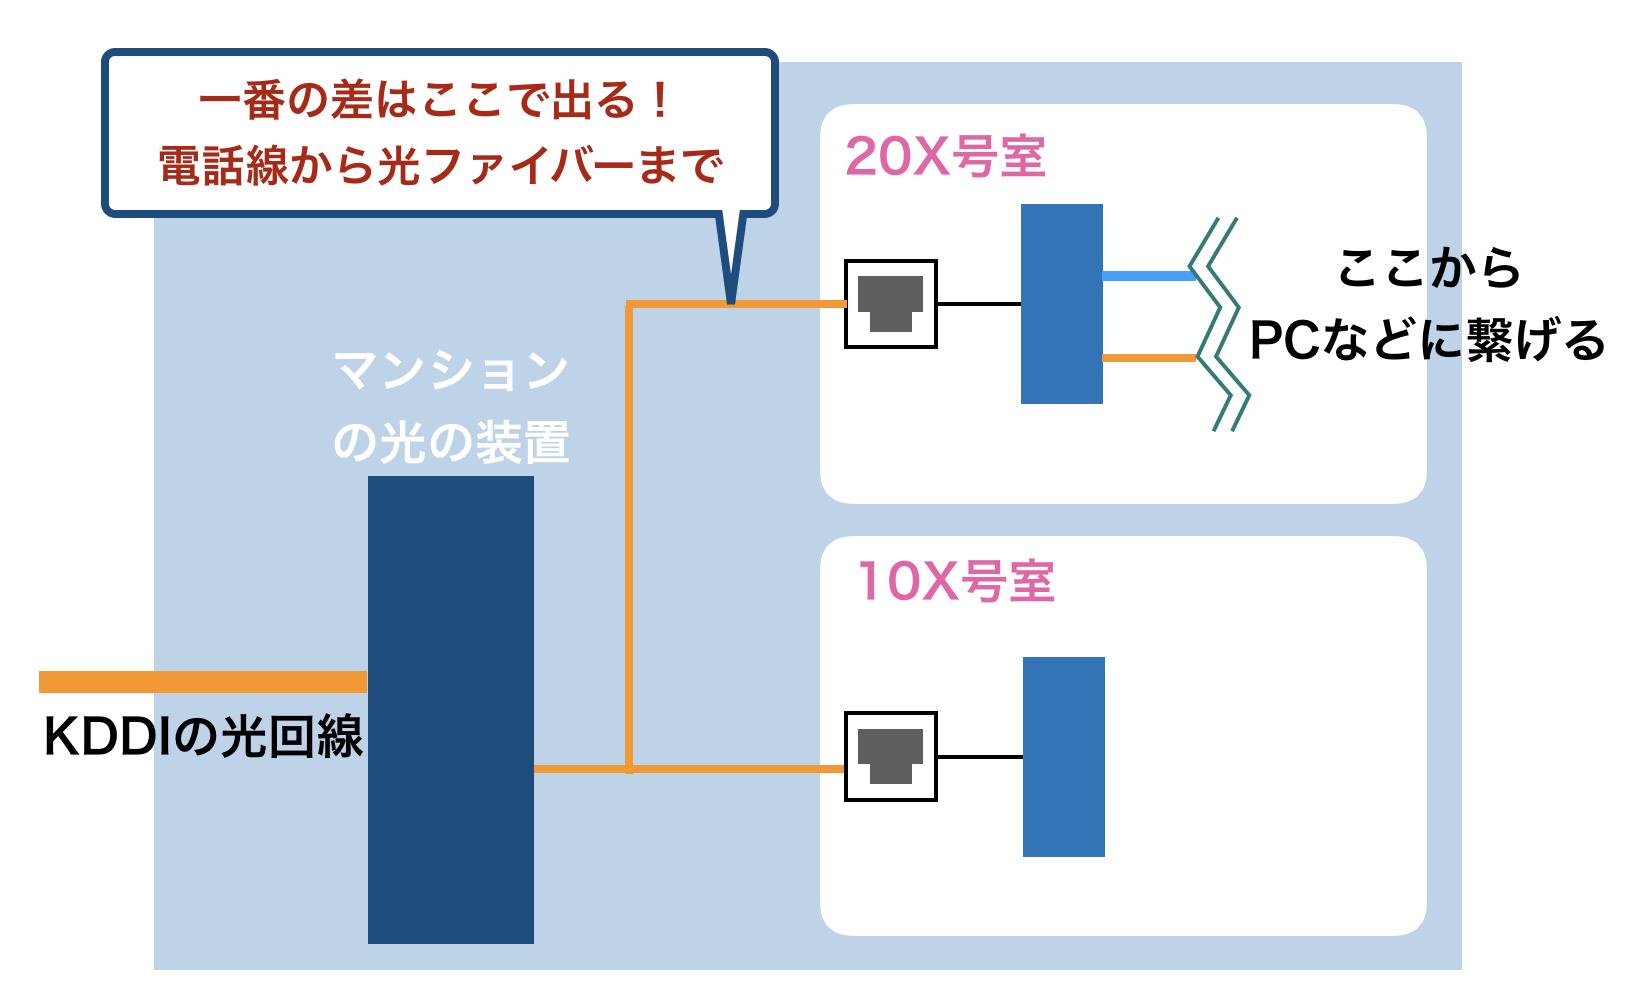 au光マンション 通信速度 マンションの配管